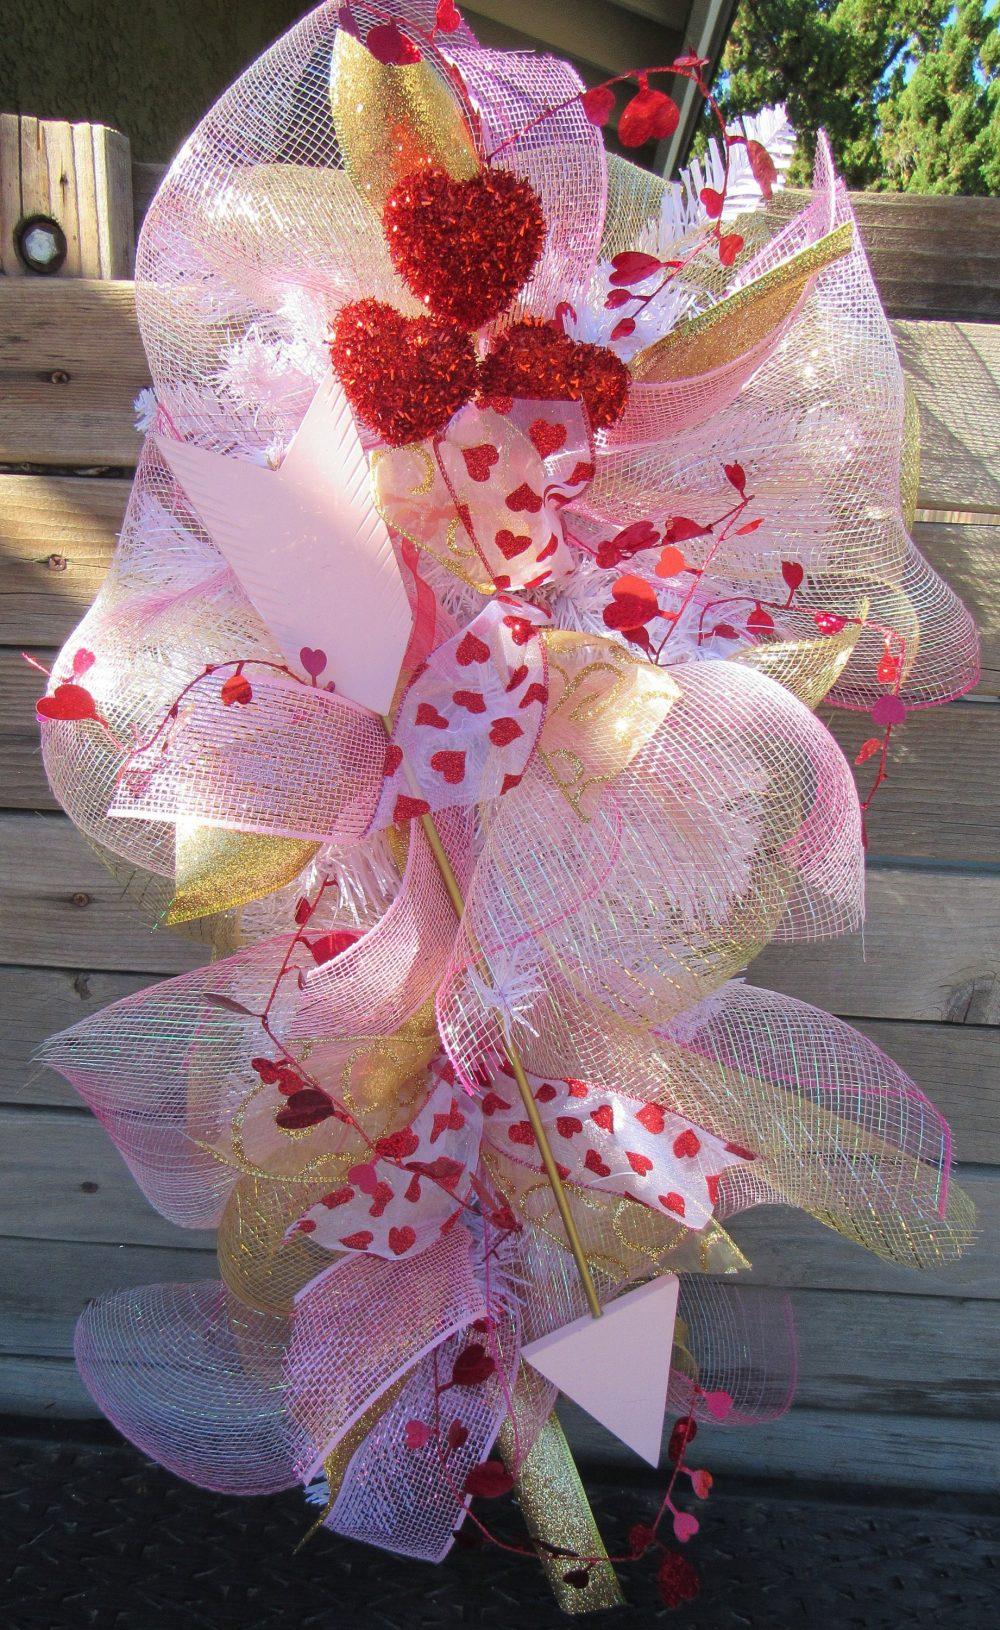 "24"" Valentines Day Wreath Door Decor Heart Mesh Swag V-Day Pink Gold Arrow Bridal Shower Wedding"